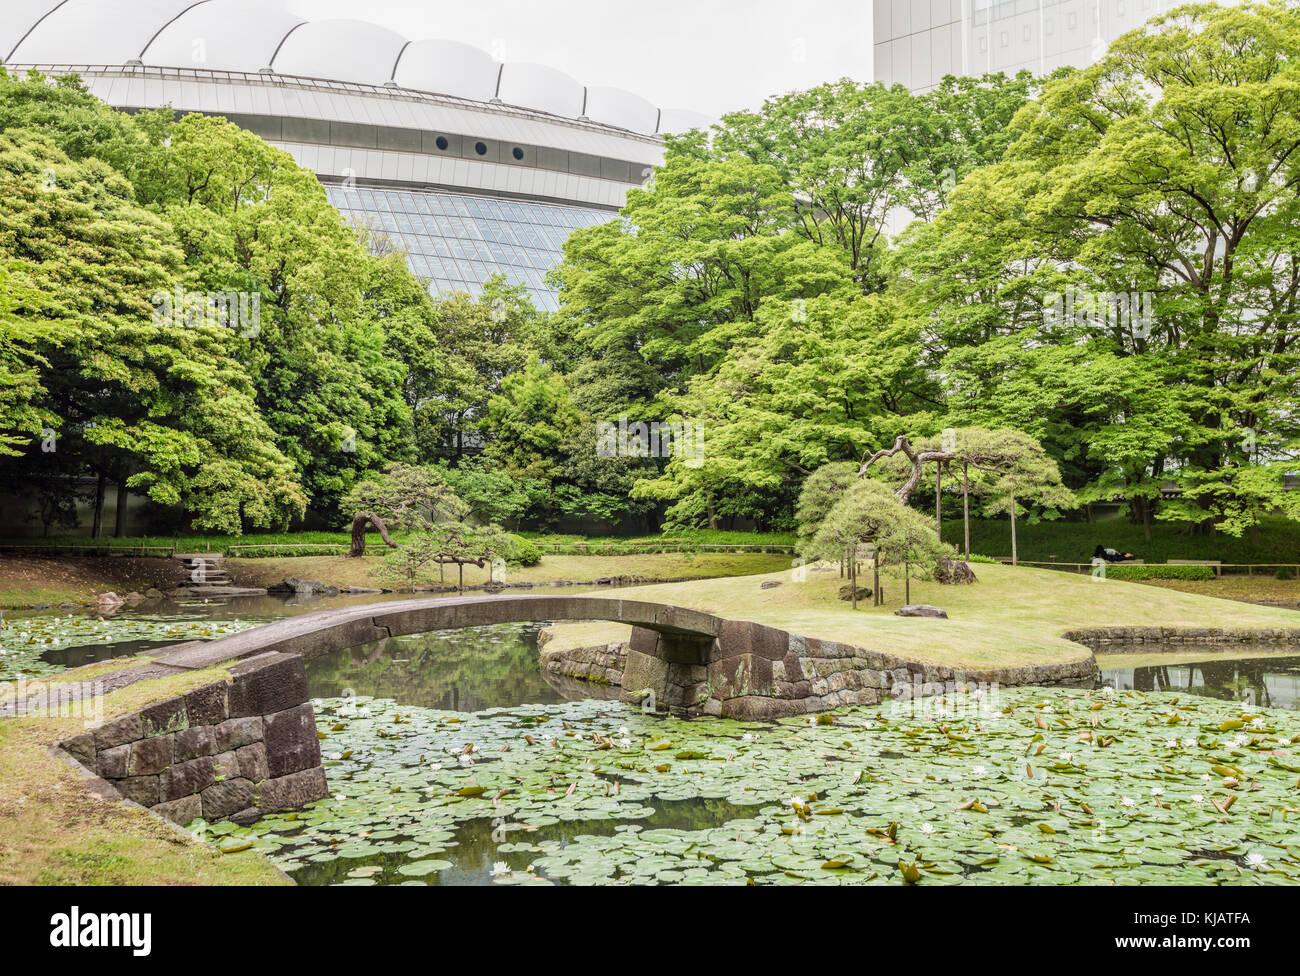 Uchi-Niwa at Koishikawa Korakuen Gardens, Tokyo, Japan   Uchi-Niwa im Koishikawa Korakuen Garten, Tokio, Japan - Stock Image